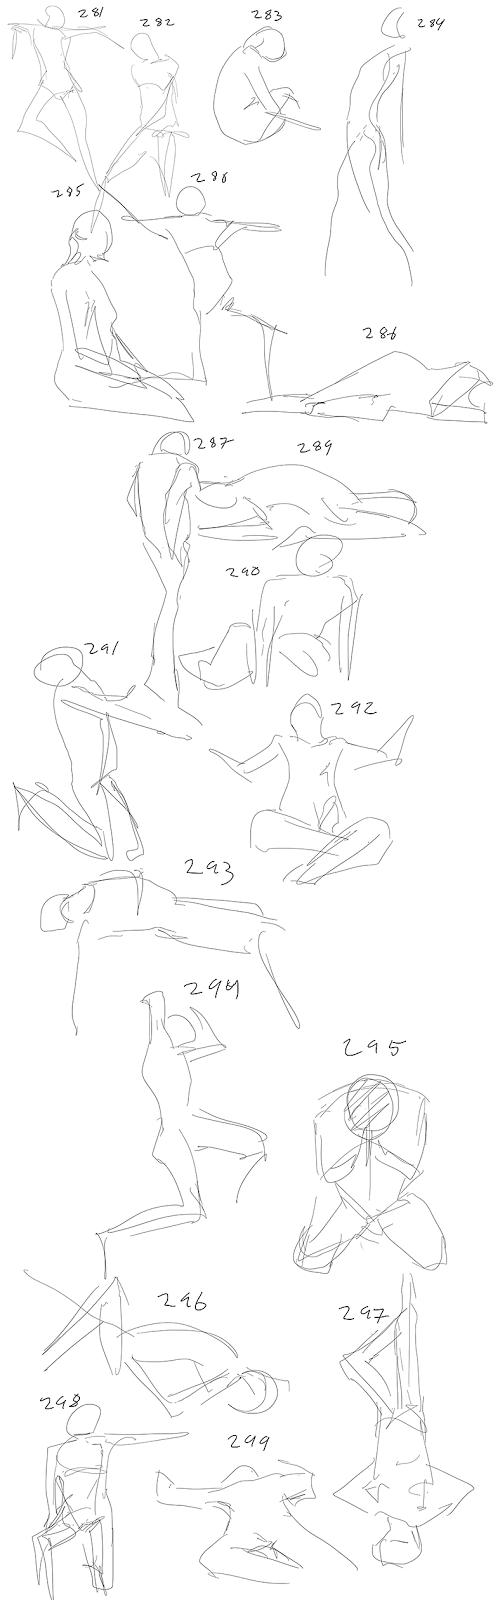 [Image: Gestures_10.png]